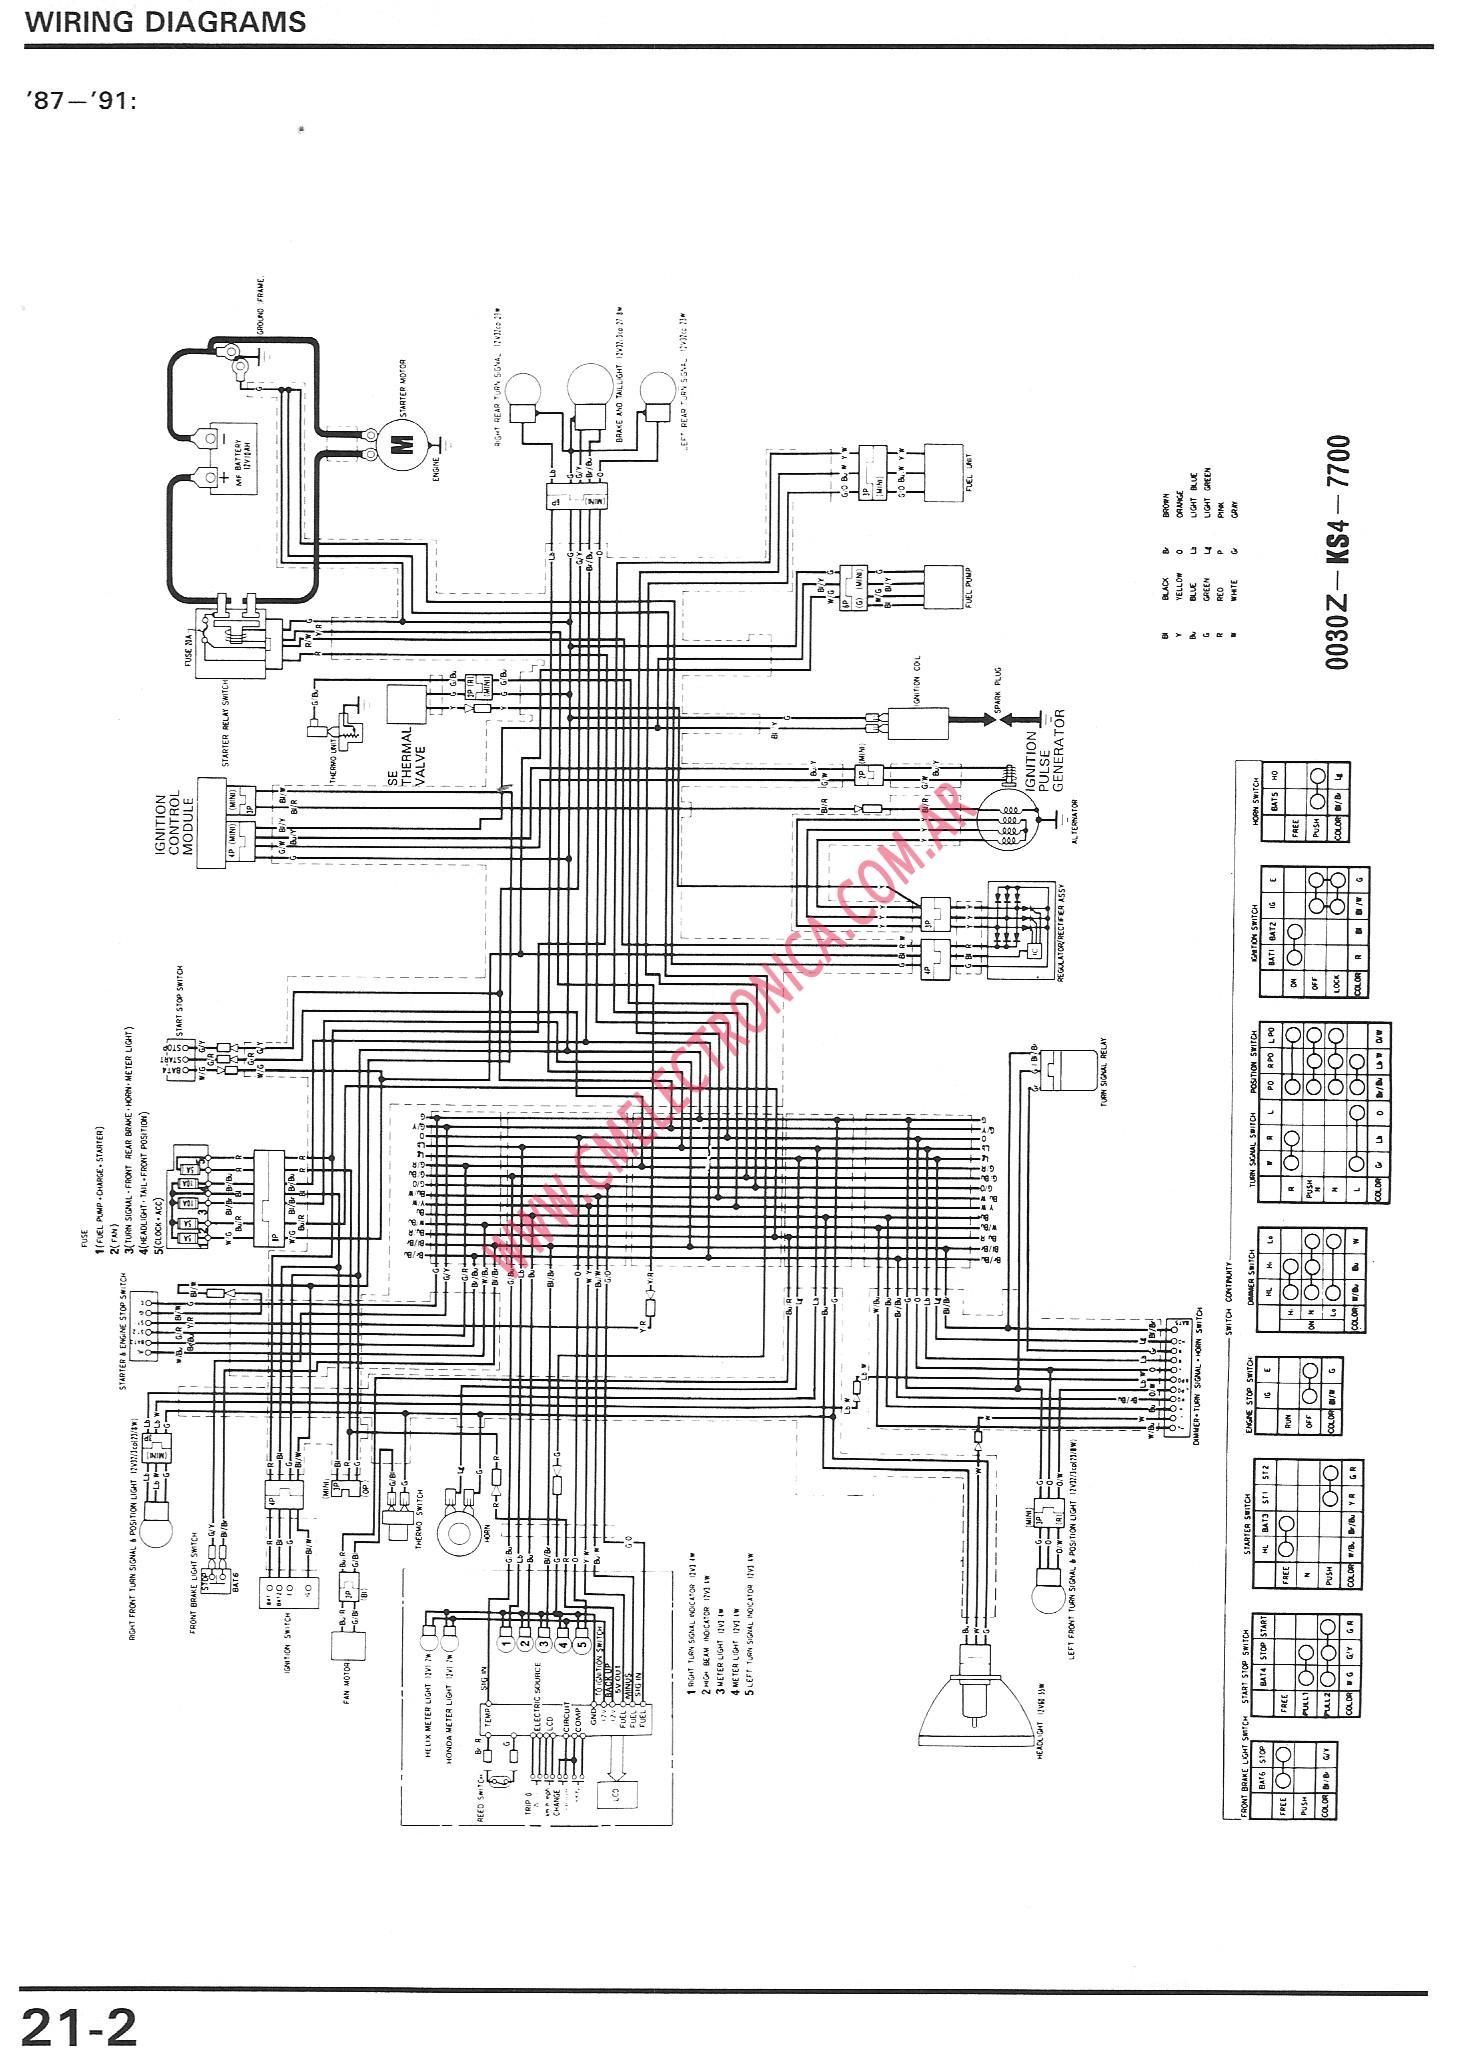 1988 grumman wiring diagram